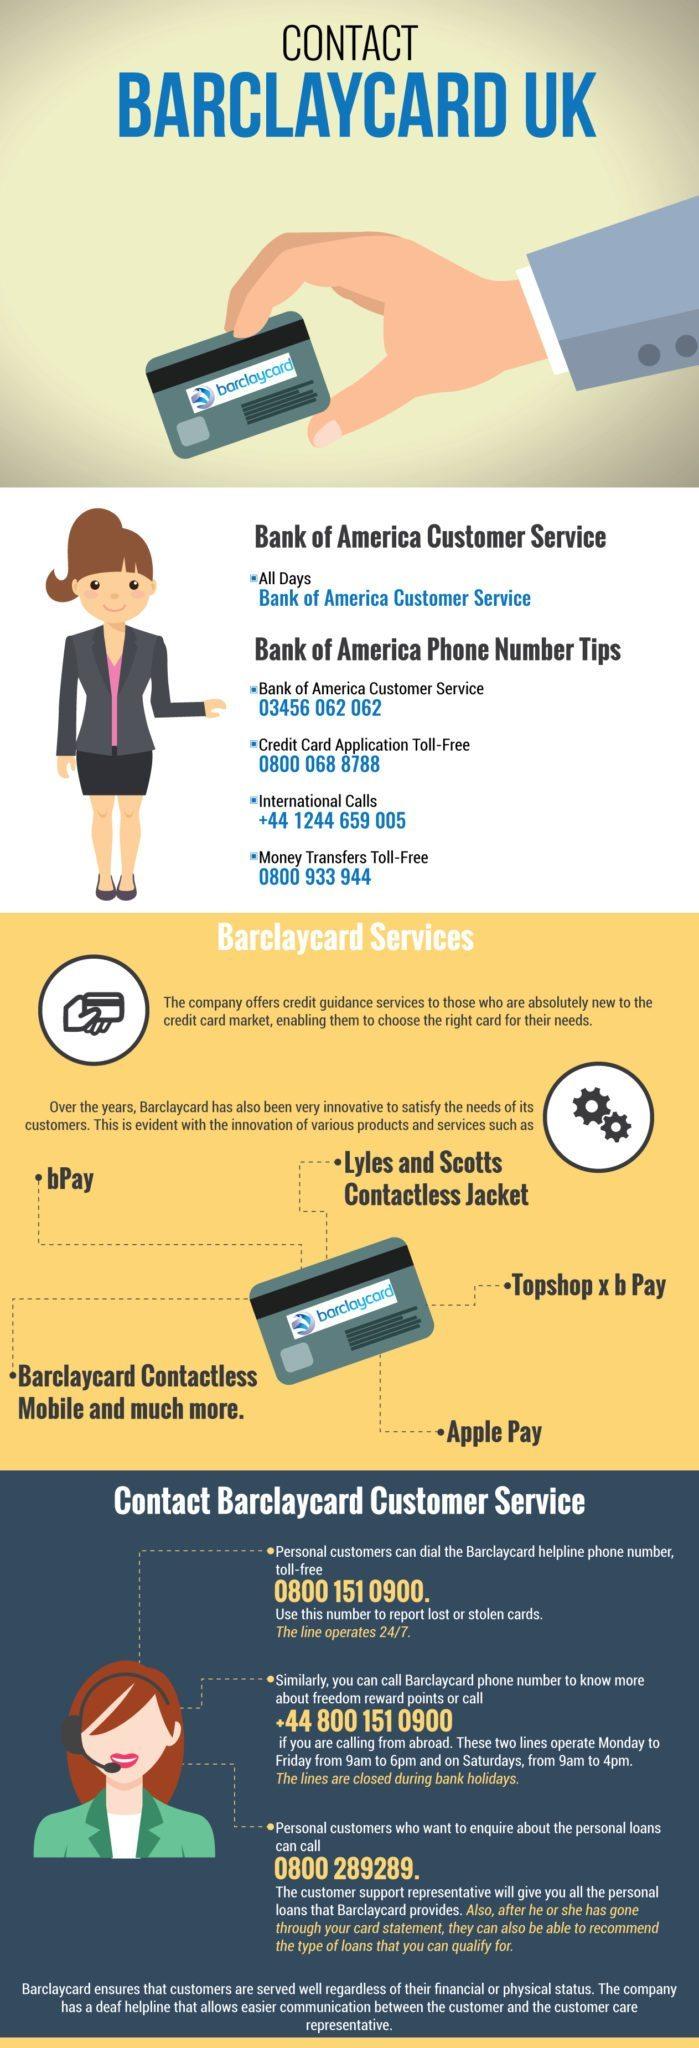 Barclaycard Customer Service 0025299011075 Phone Number Uk